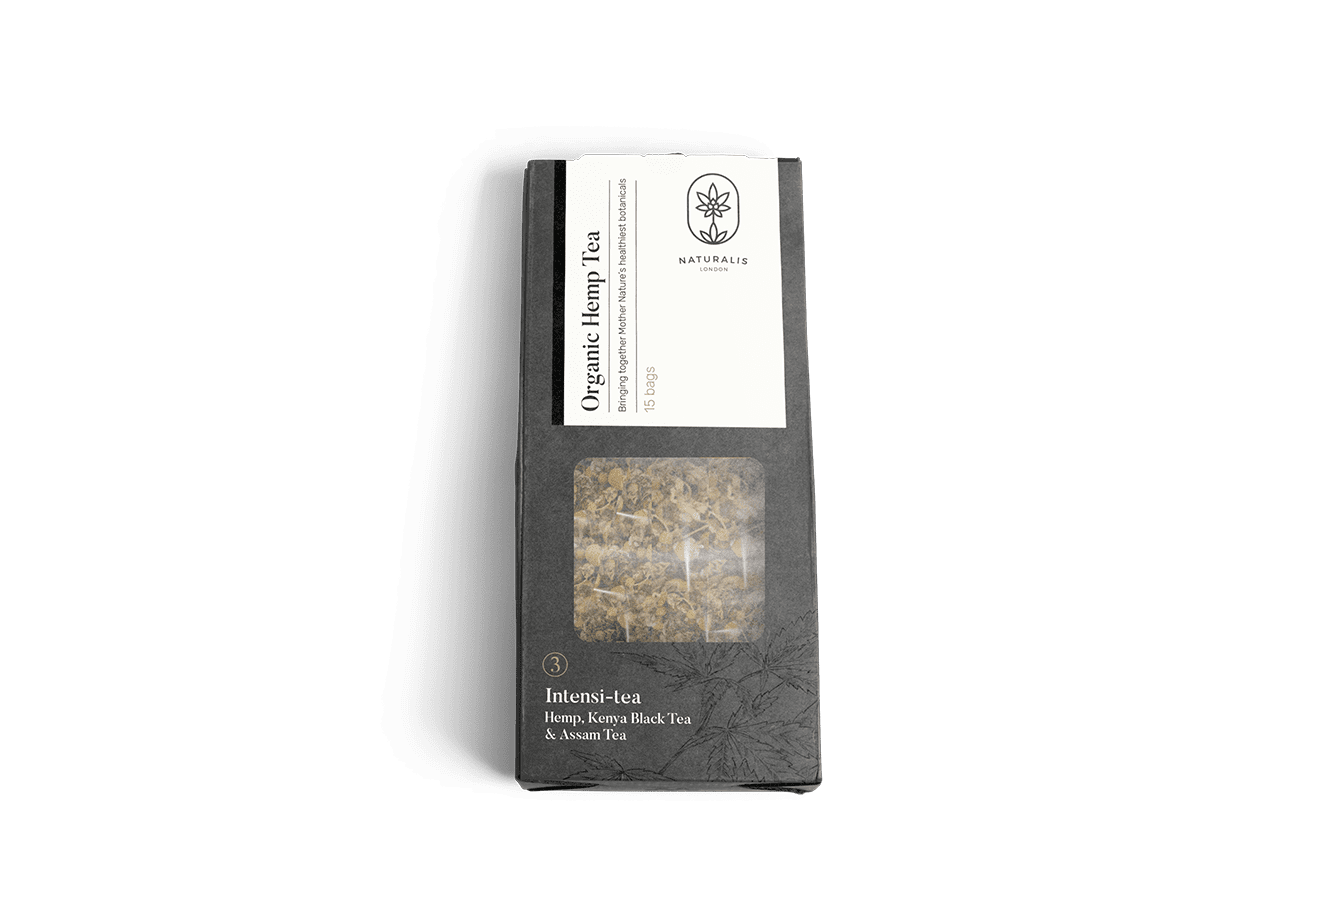 Organic Hemp Tea: Intensi-tea